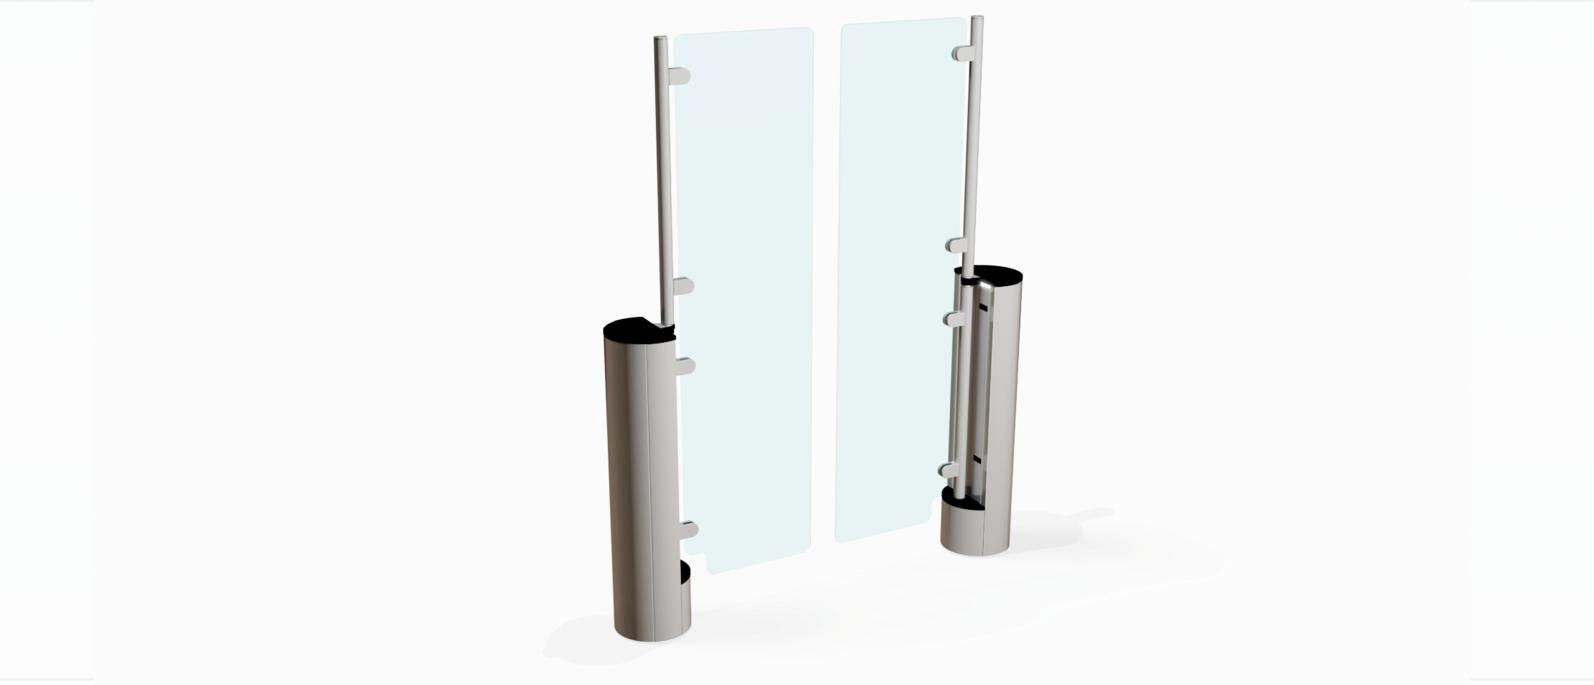 Fastlane Intelligate 300 entrance control security turnstile